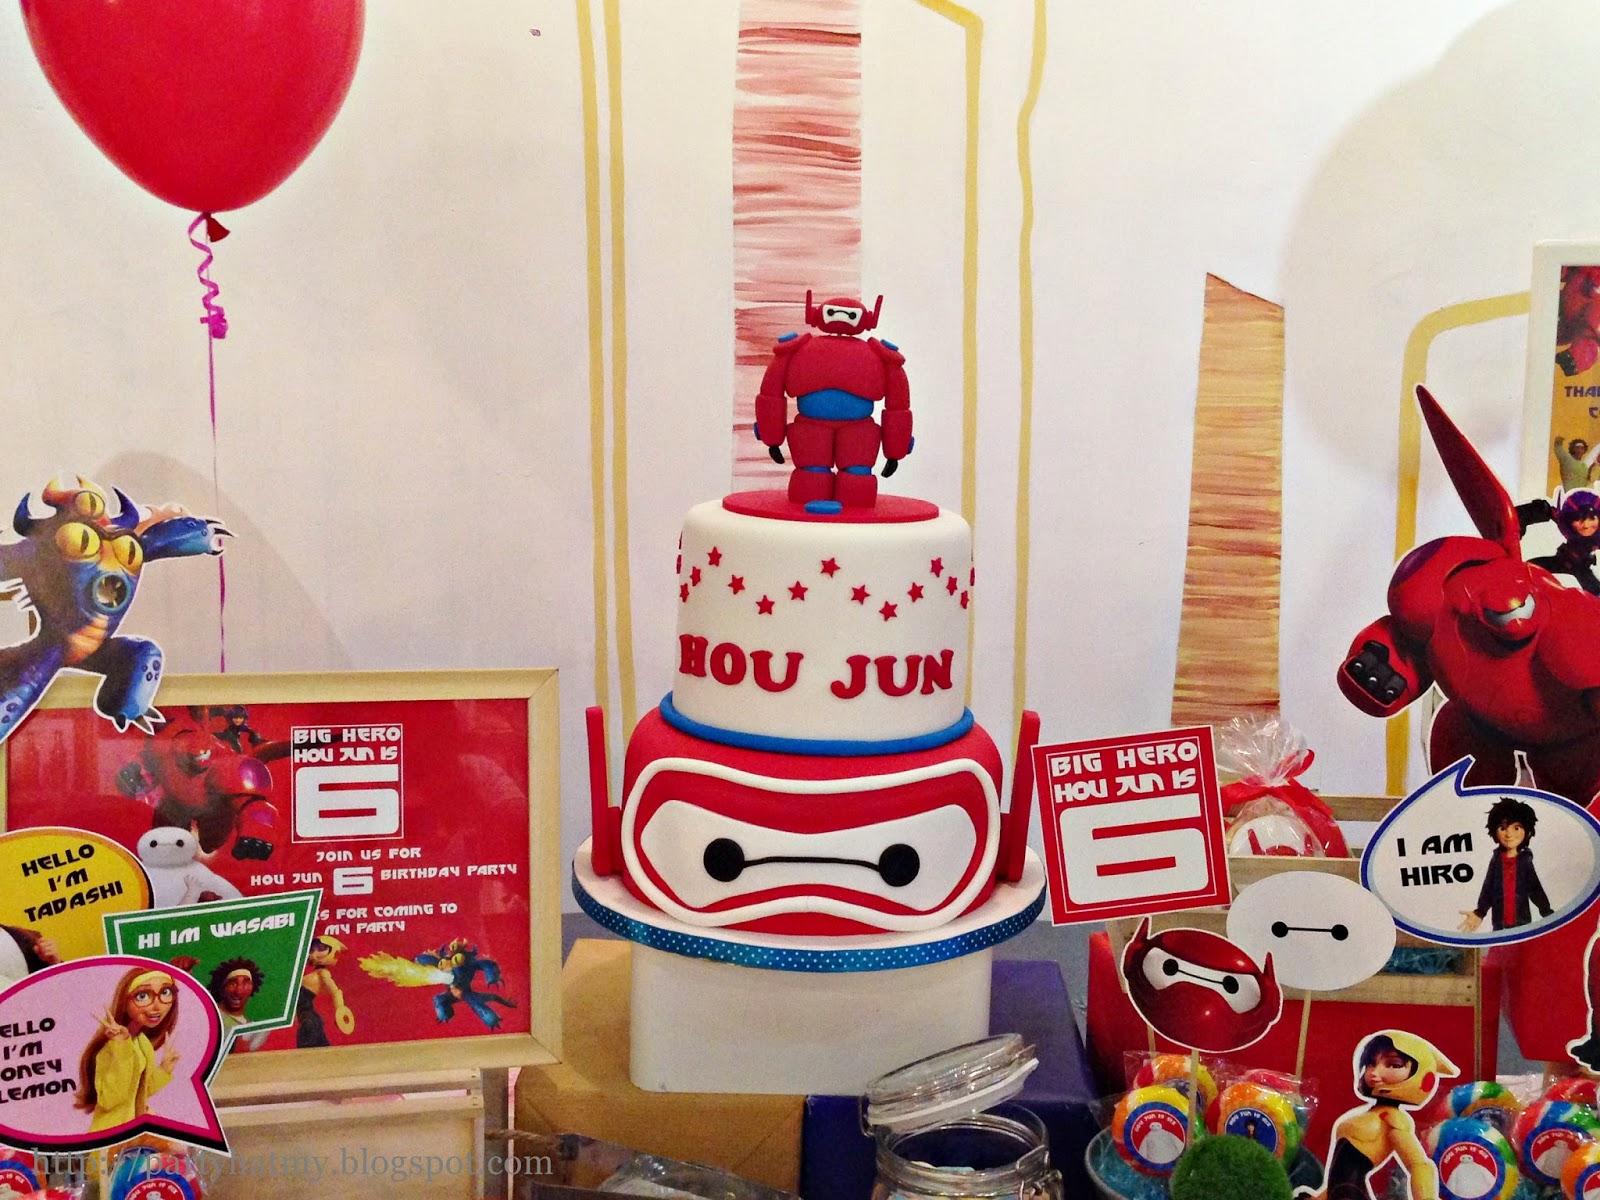 Big Hero 6 Birthday Party For Hou Jun